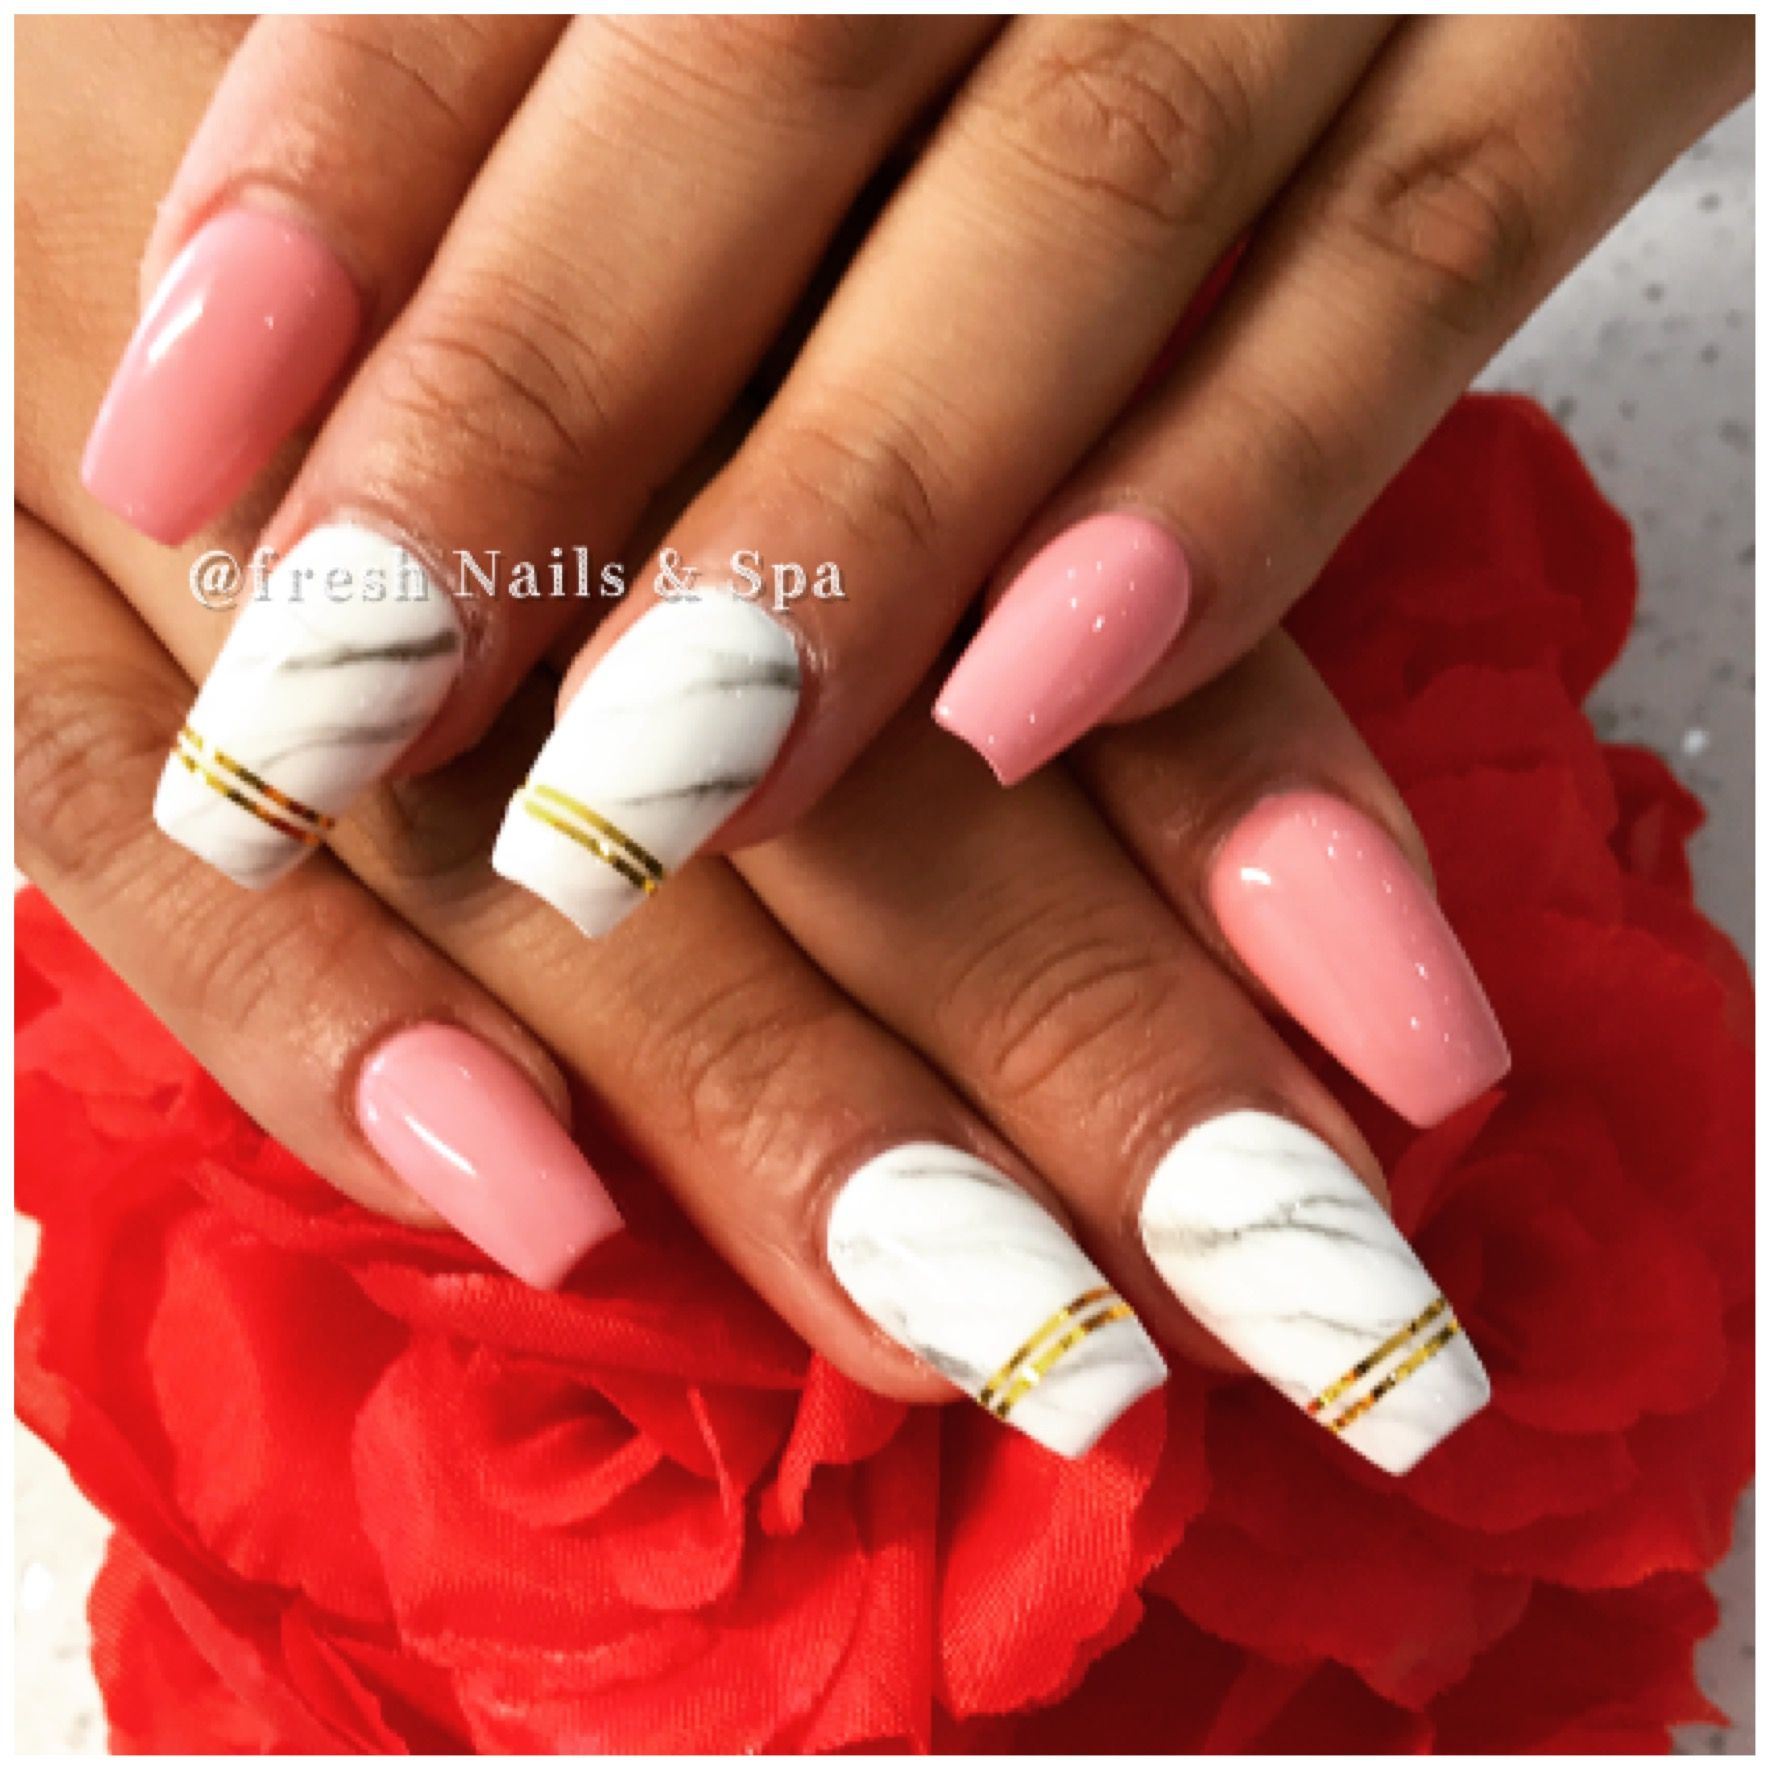 Pin by Fresh Nails & Spa on Fresh\' nail art | Pinterest